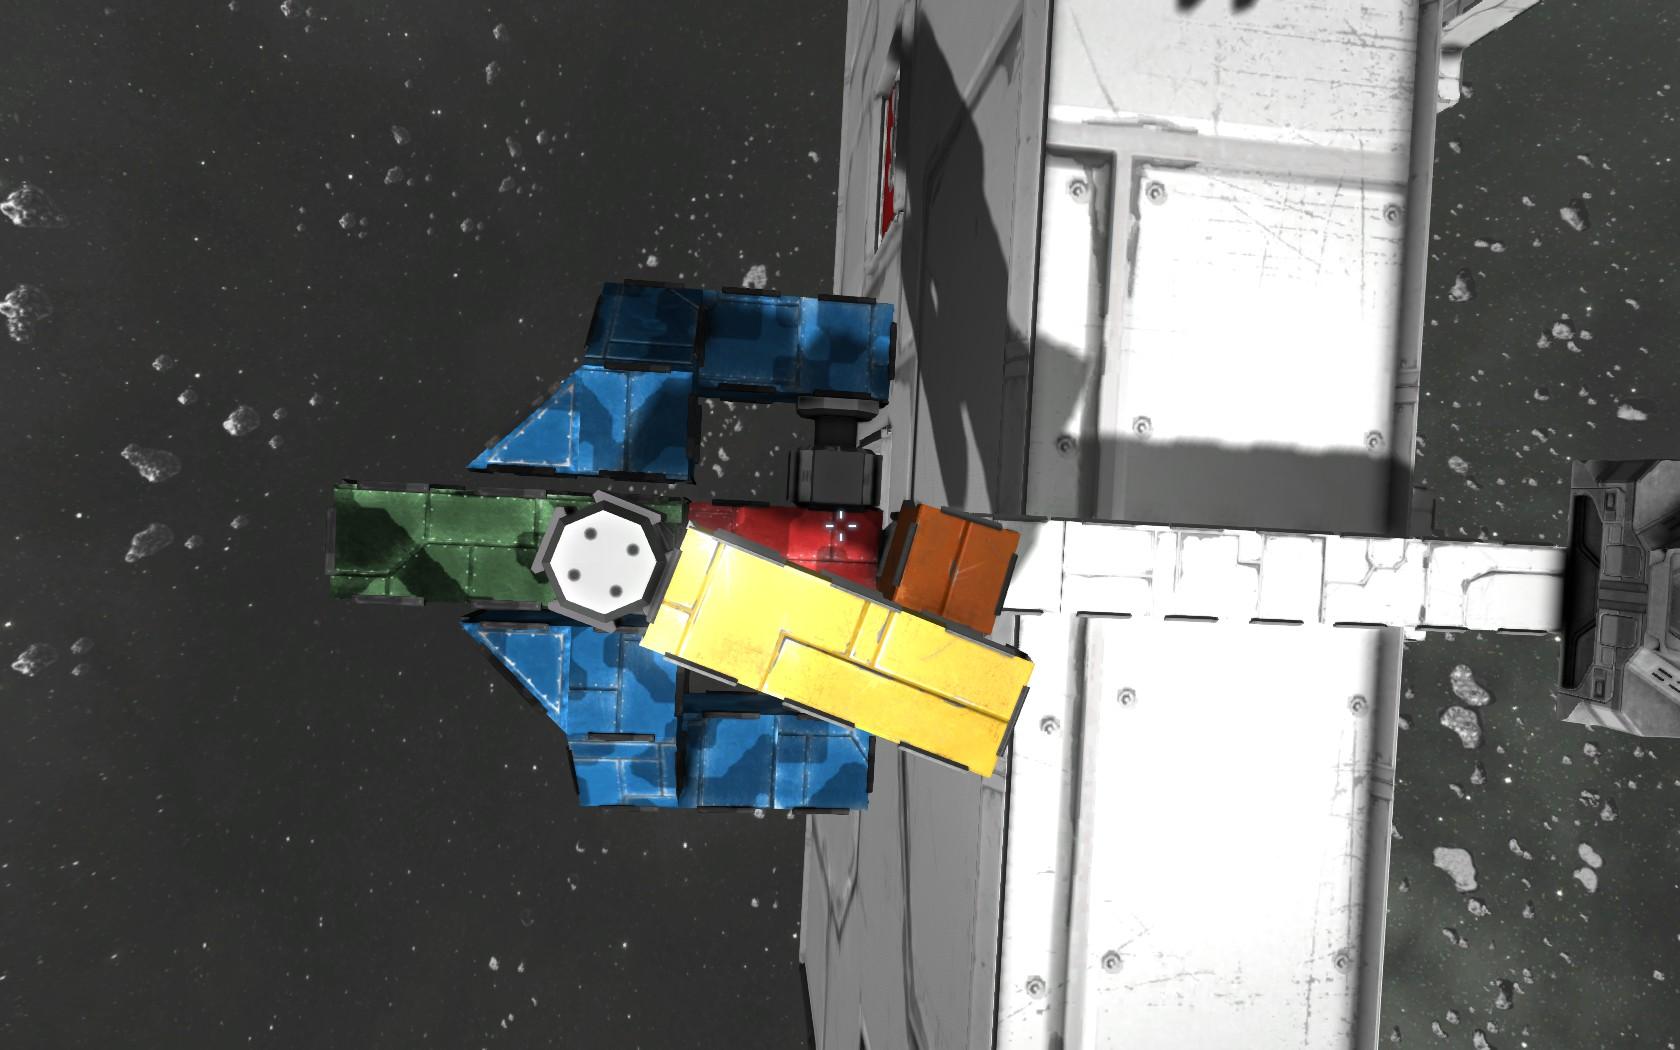 Rotor | Space Engineers Wiki | FANDOM powered by Wikia